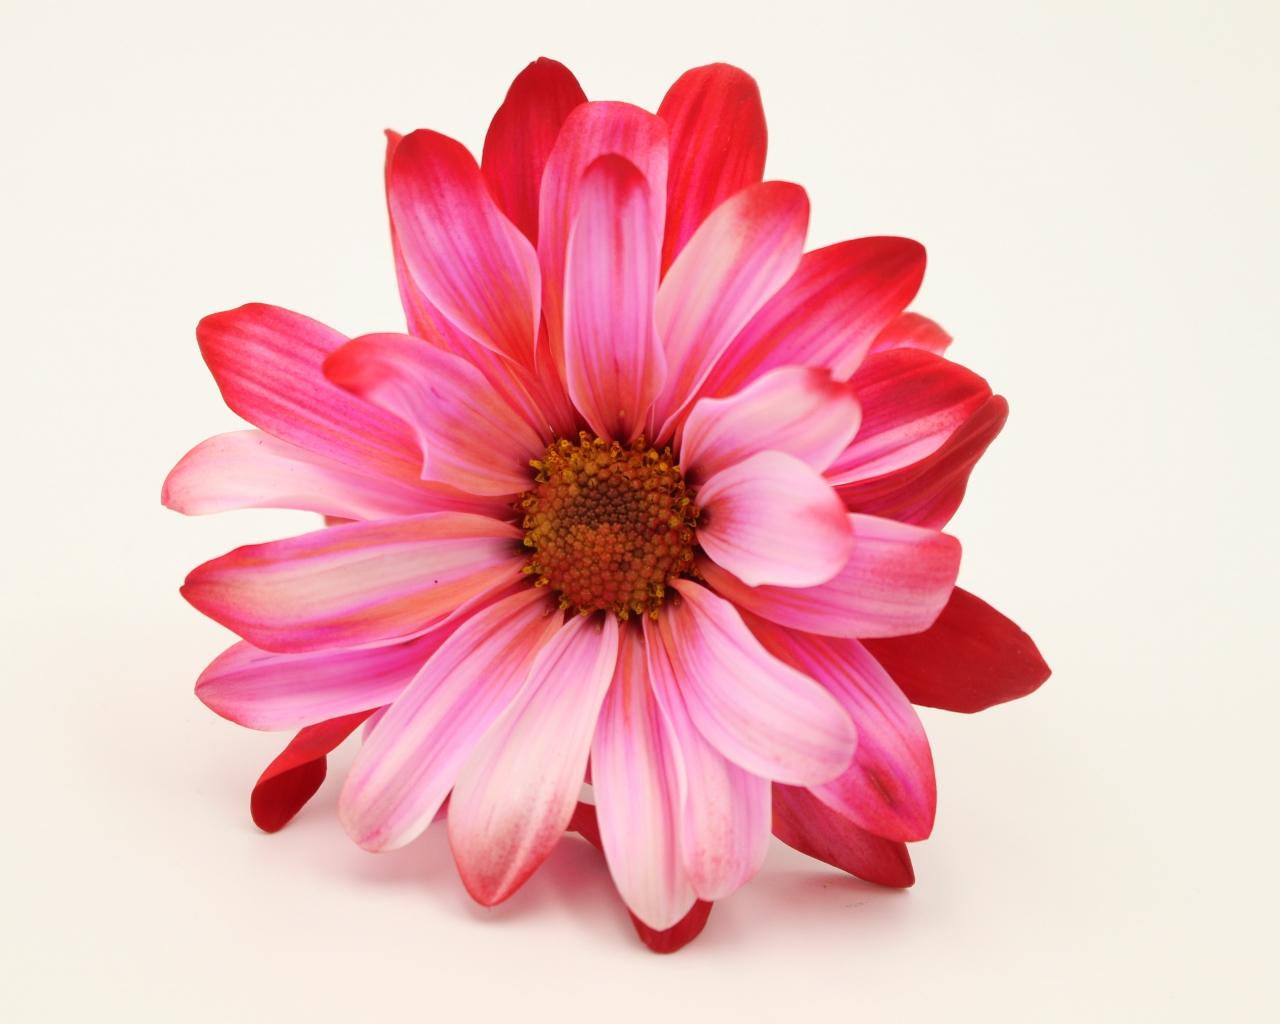 Rosas - 1280x1024